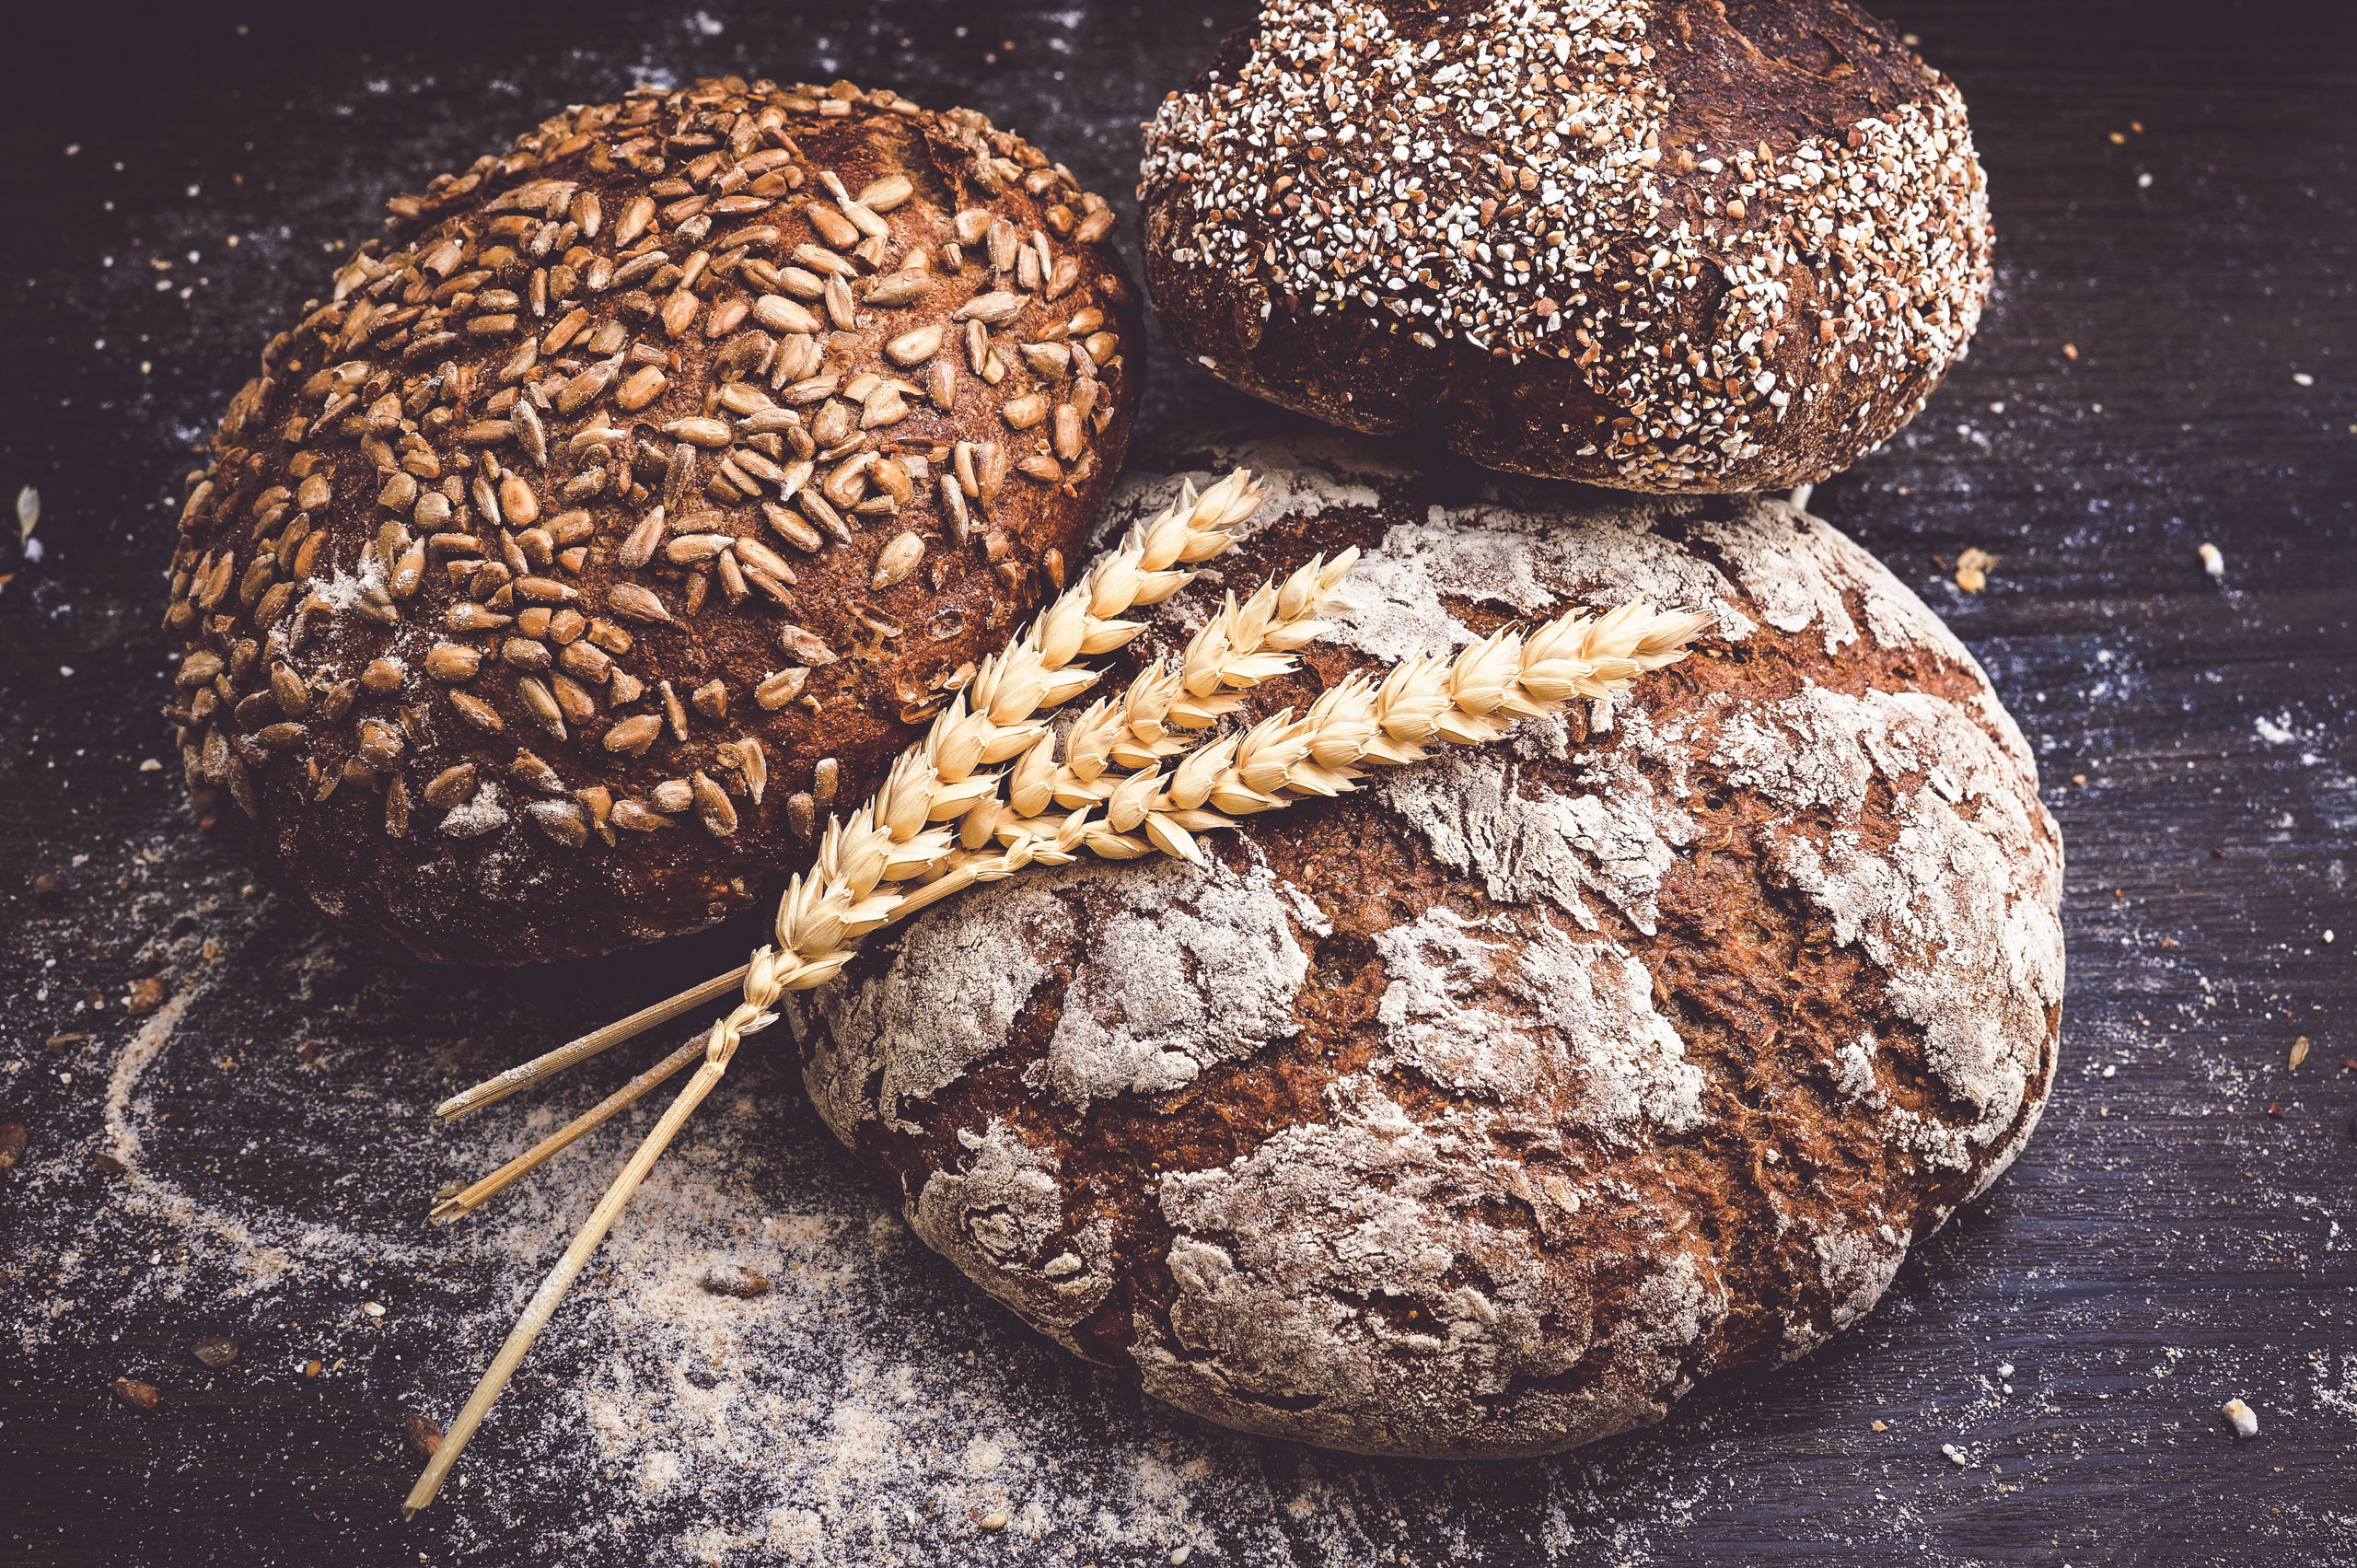 Brot aus aller Welt